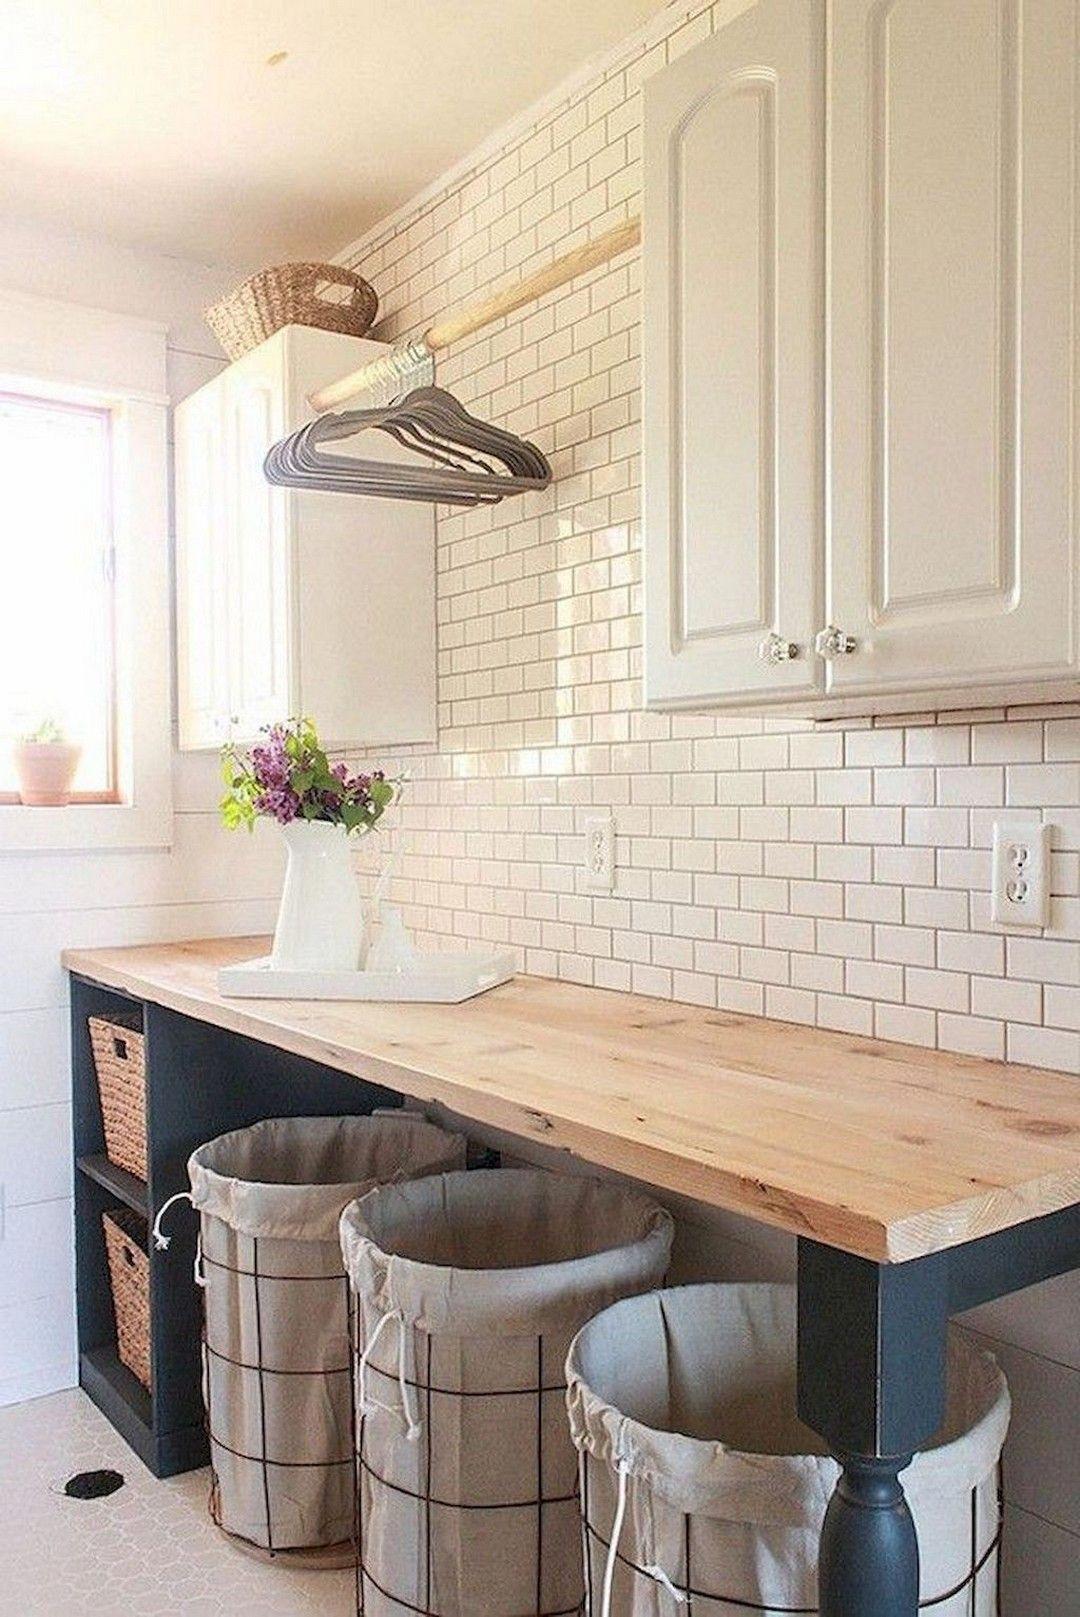 roomdecorbedroom in 2020 Farmhouse kitchen decor